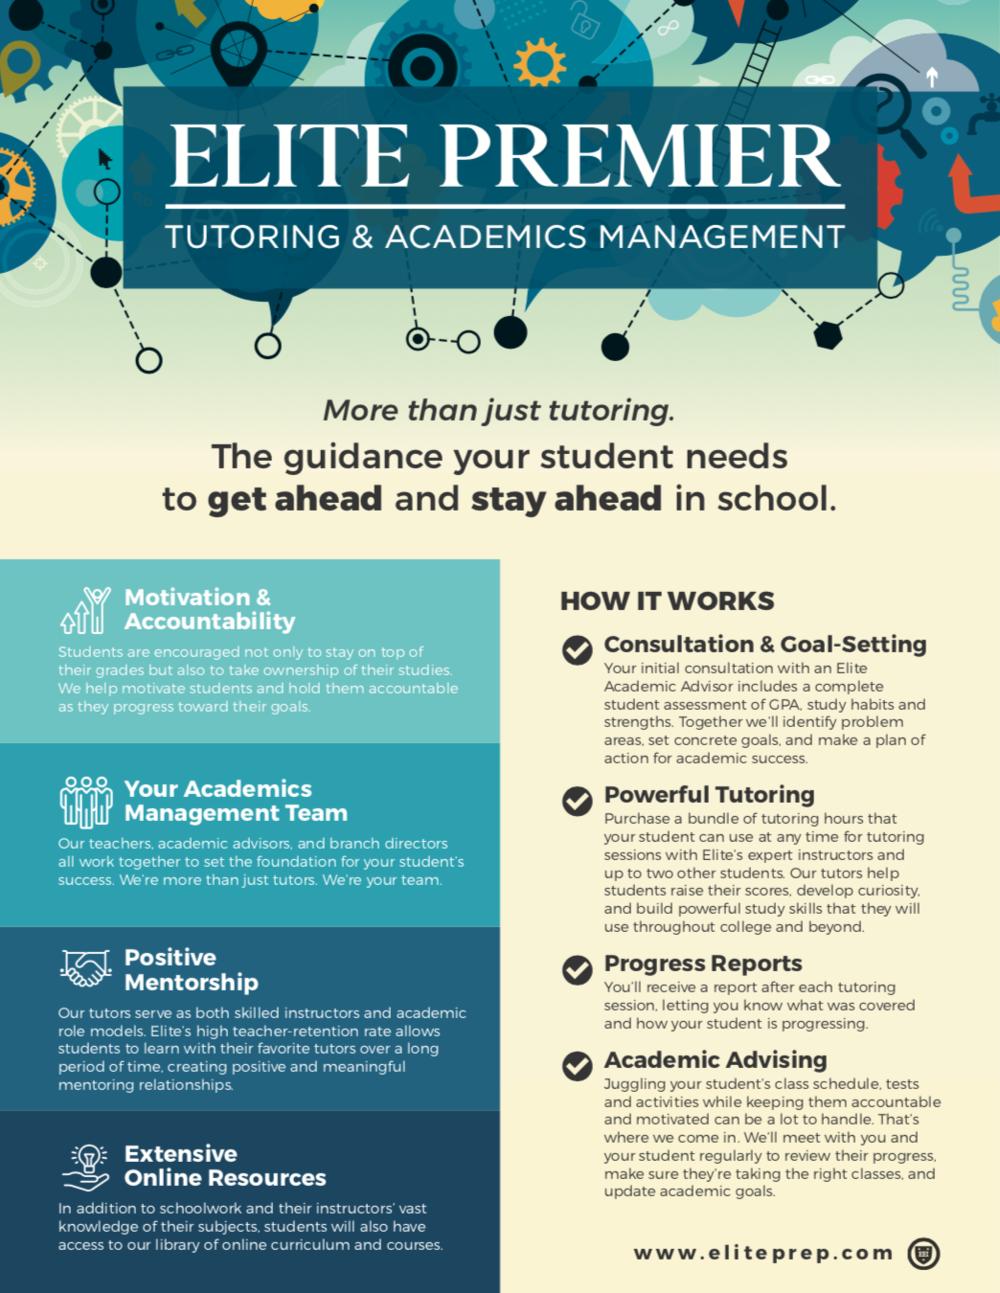 Elite Premier Tutoring and Academics Management »